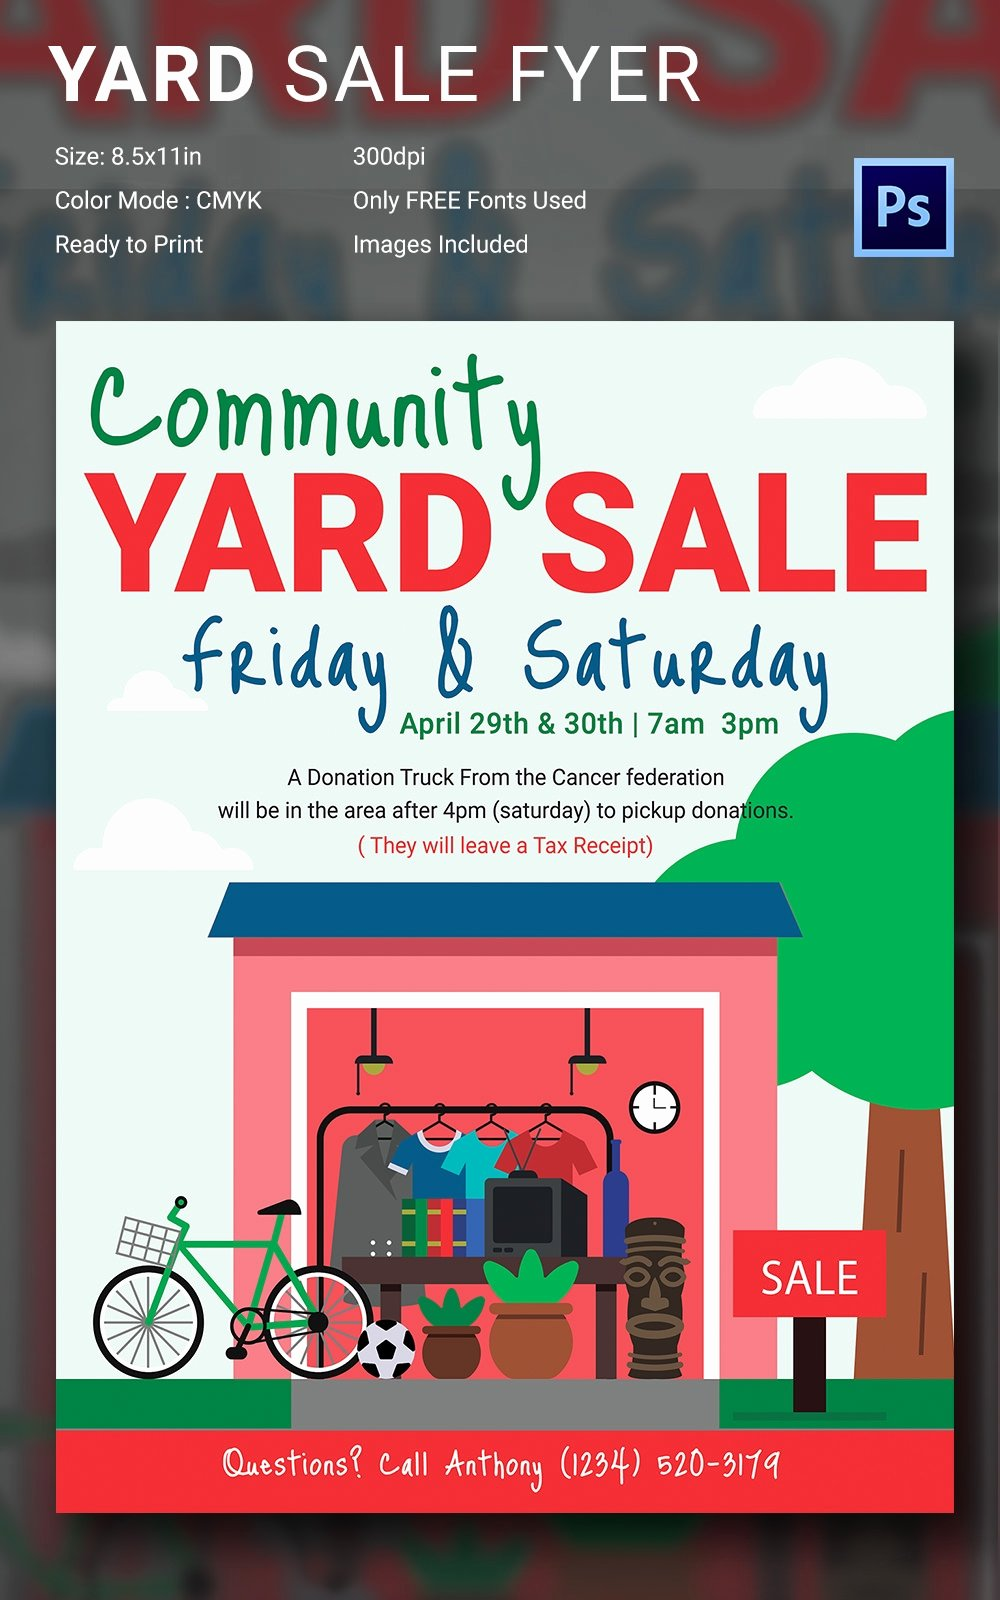 Garage Sale Flyer Template New 14 Best Yard Sale Flyer Templates & Psd Designs